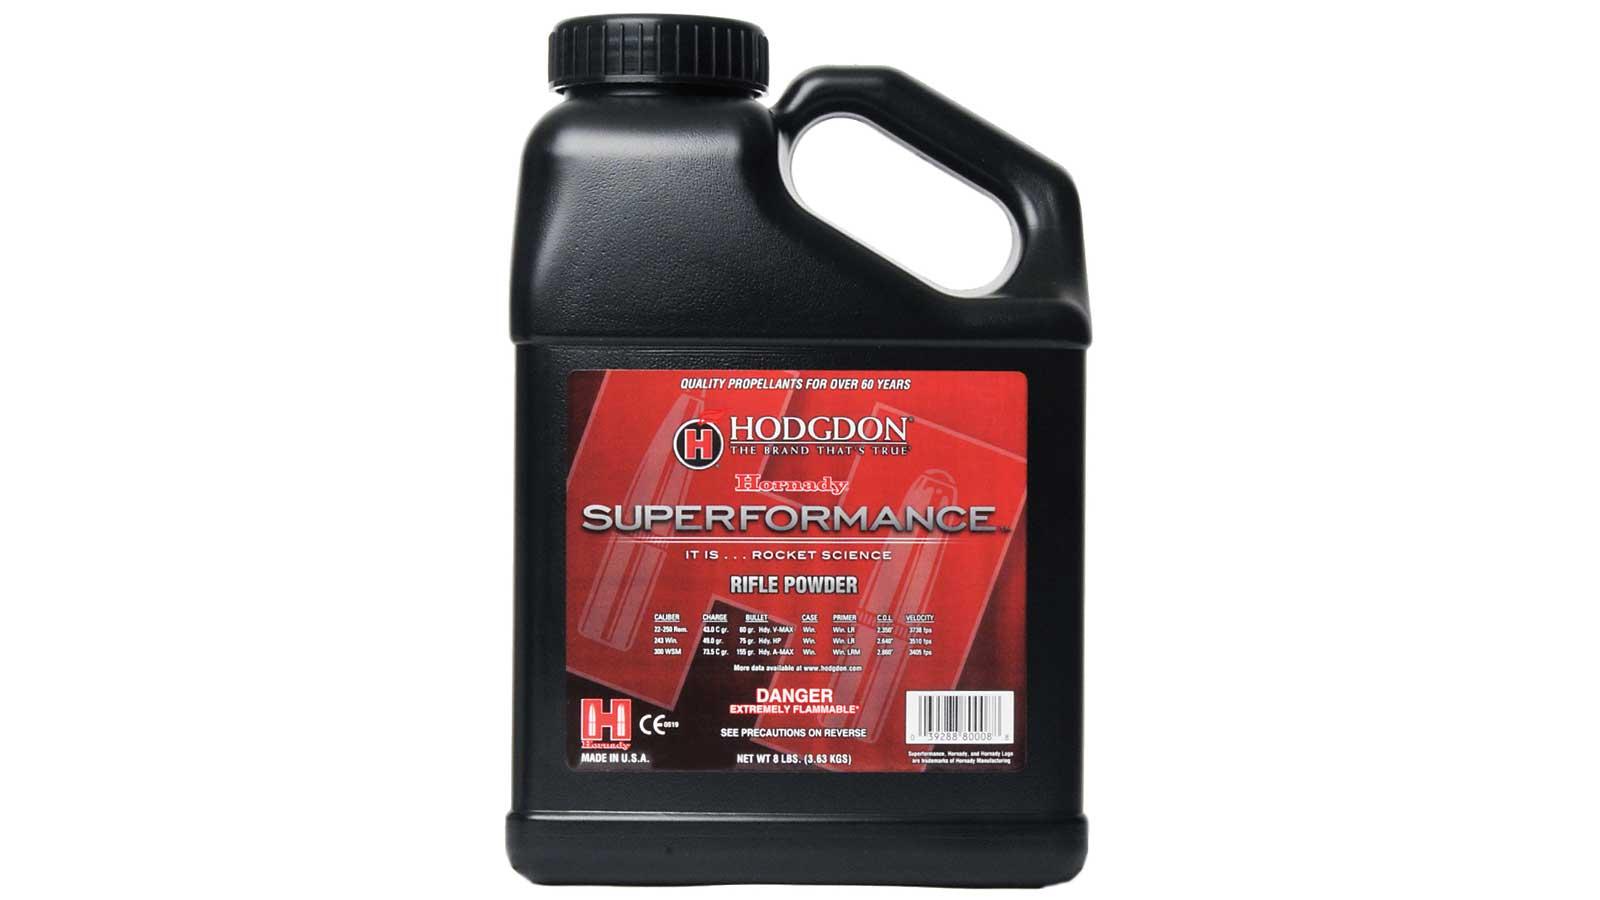 Hodgdon HSP8 Spherical Superformance Rifle Powder 8 lbs